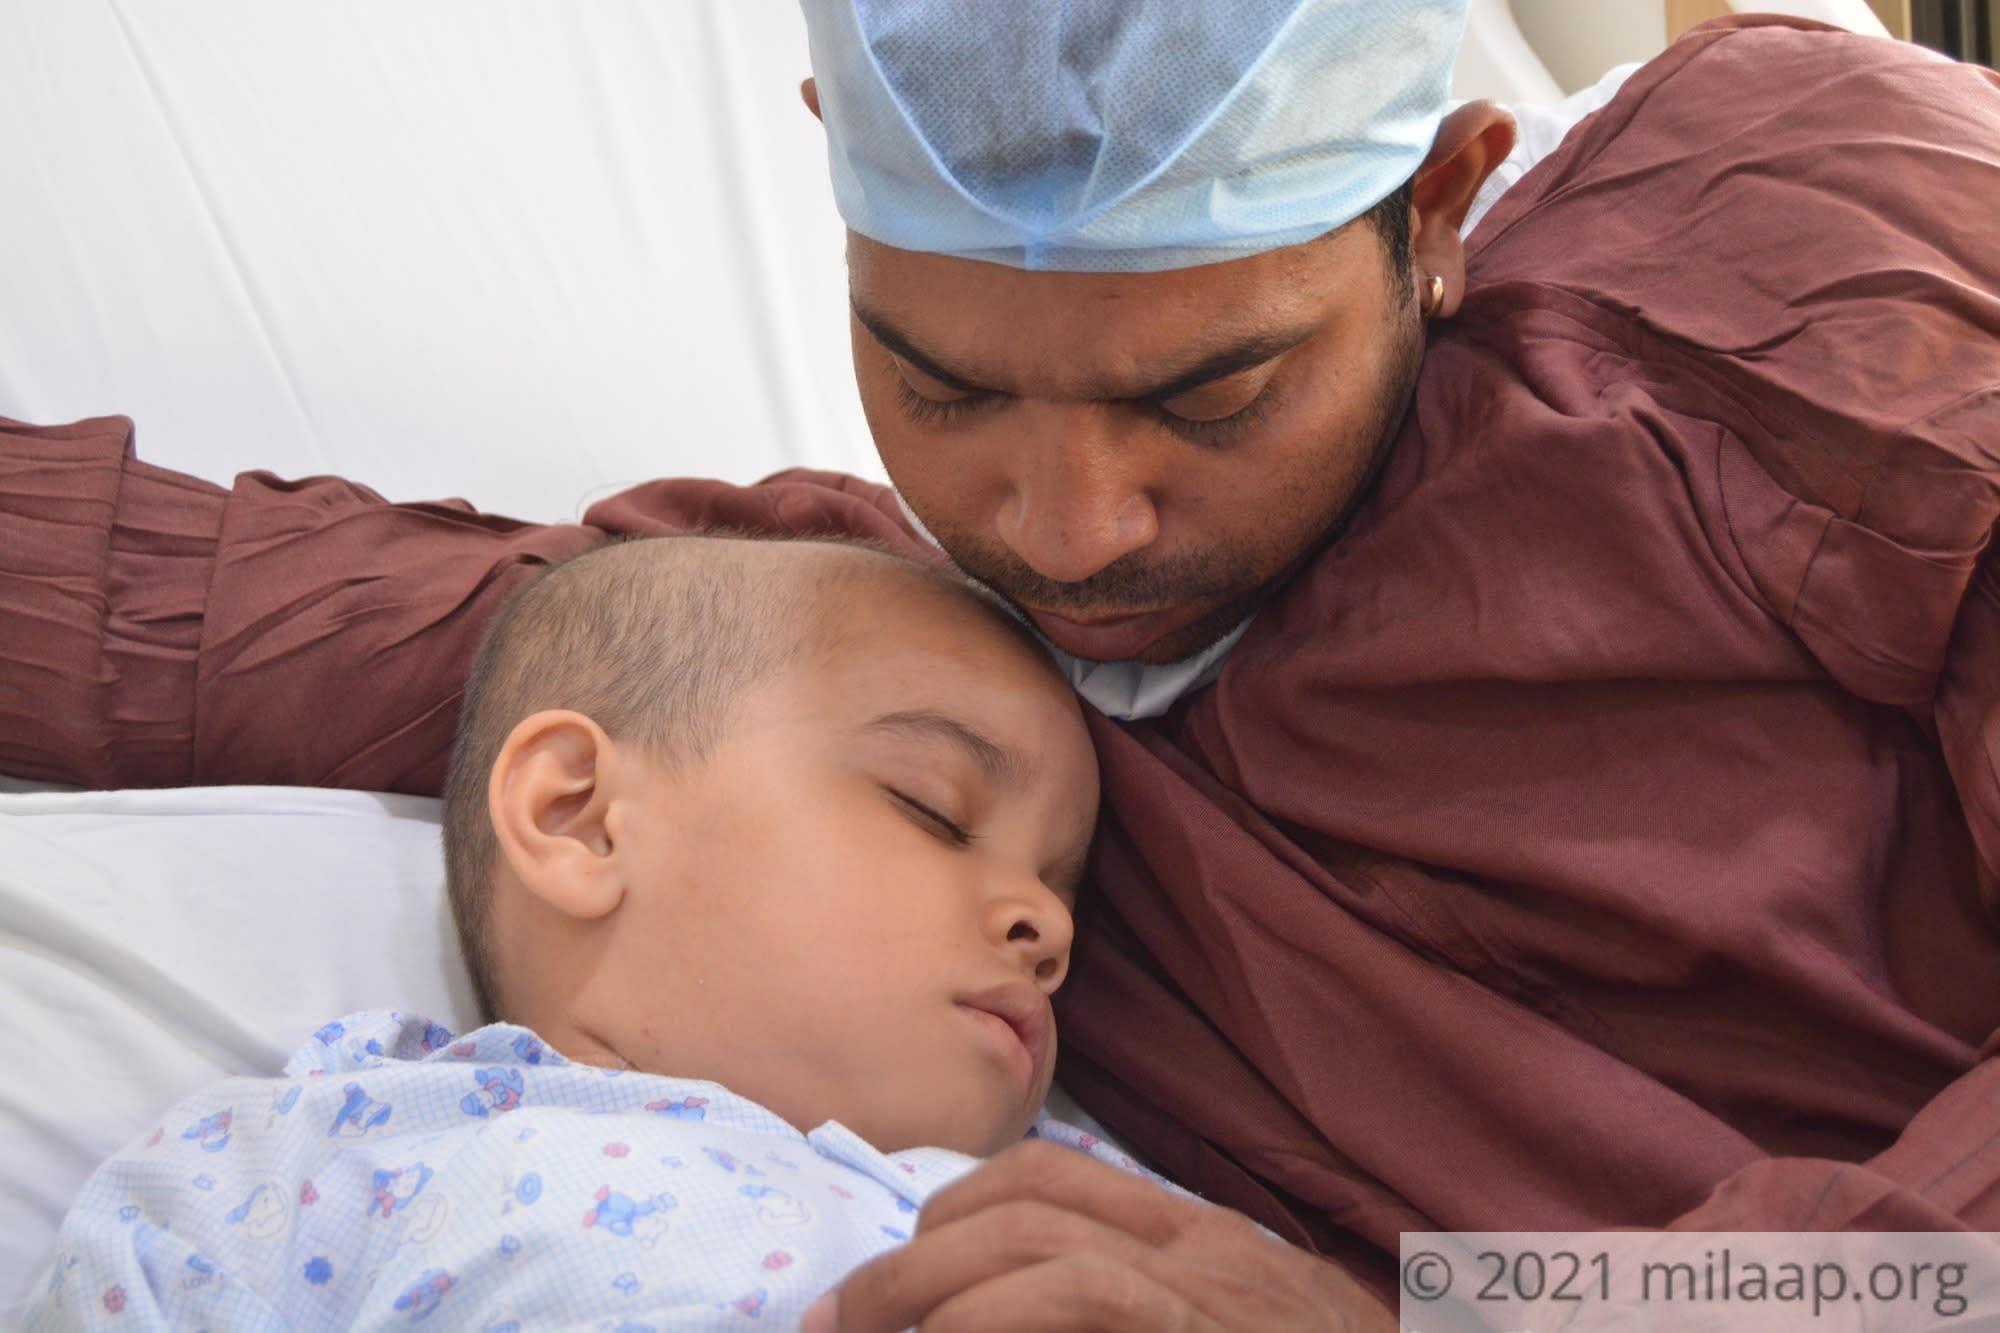 Aarush surya hospital 38 sy8dr7 1574139355